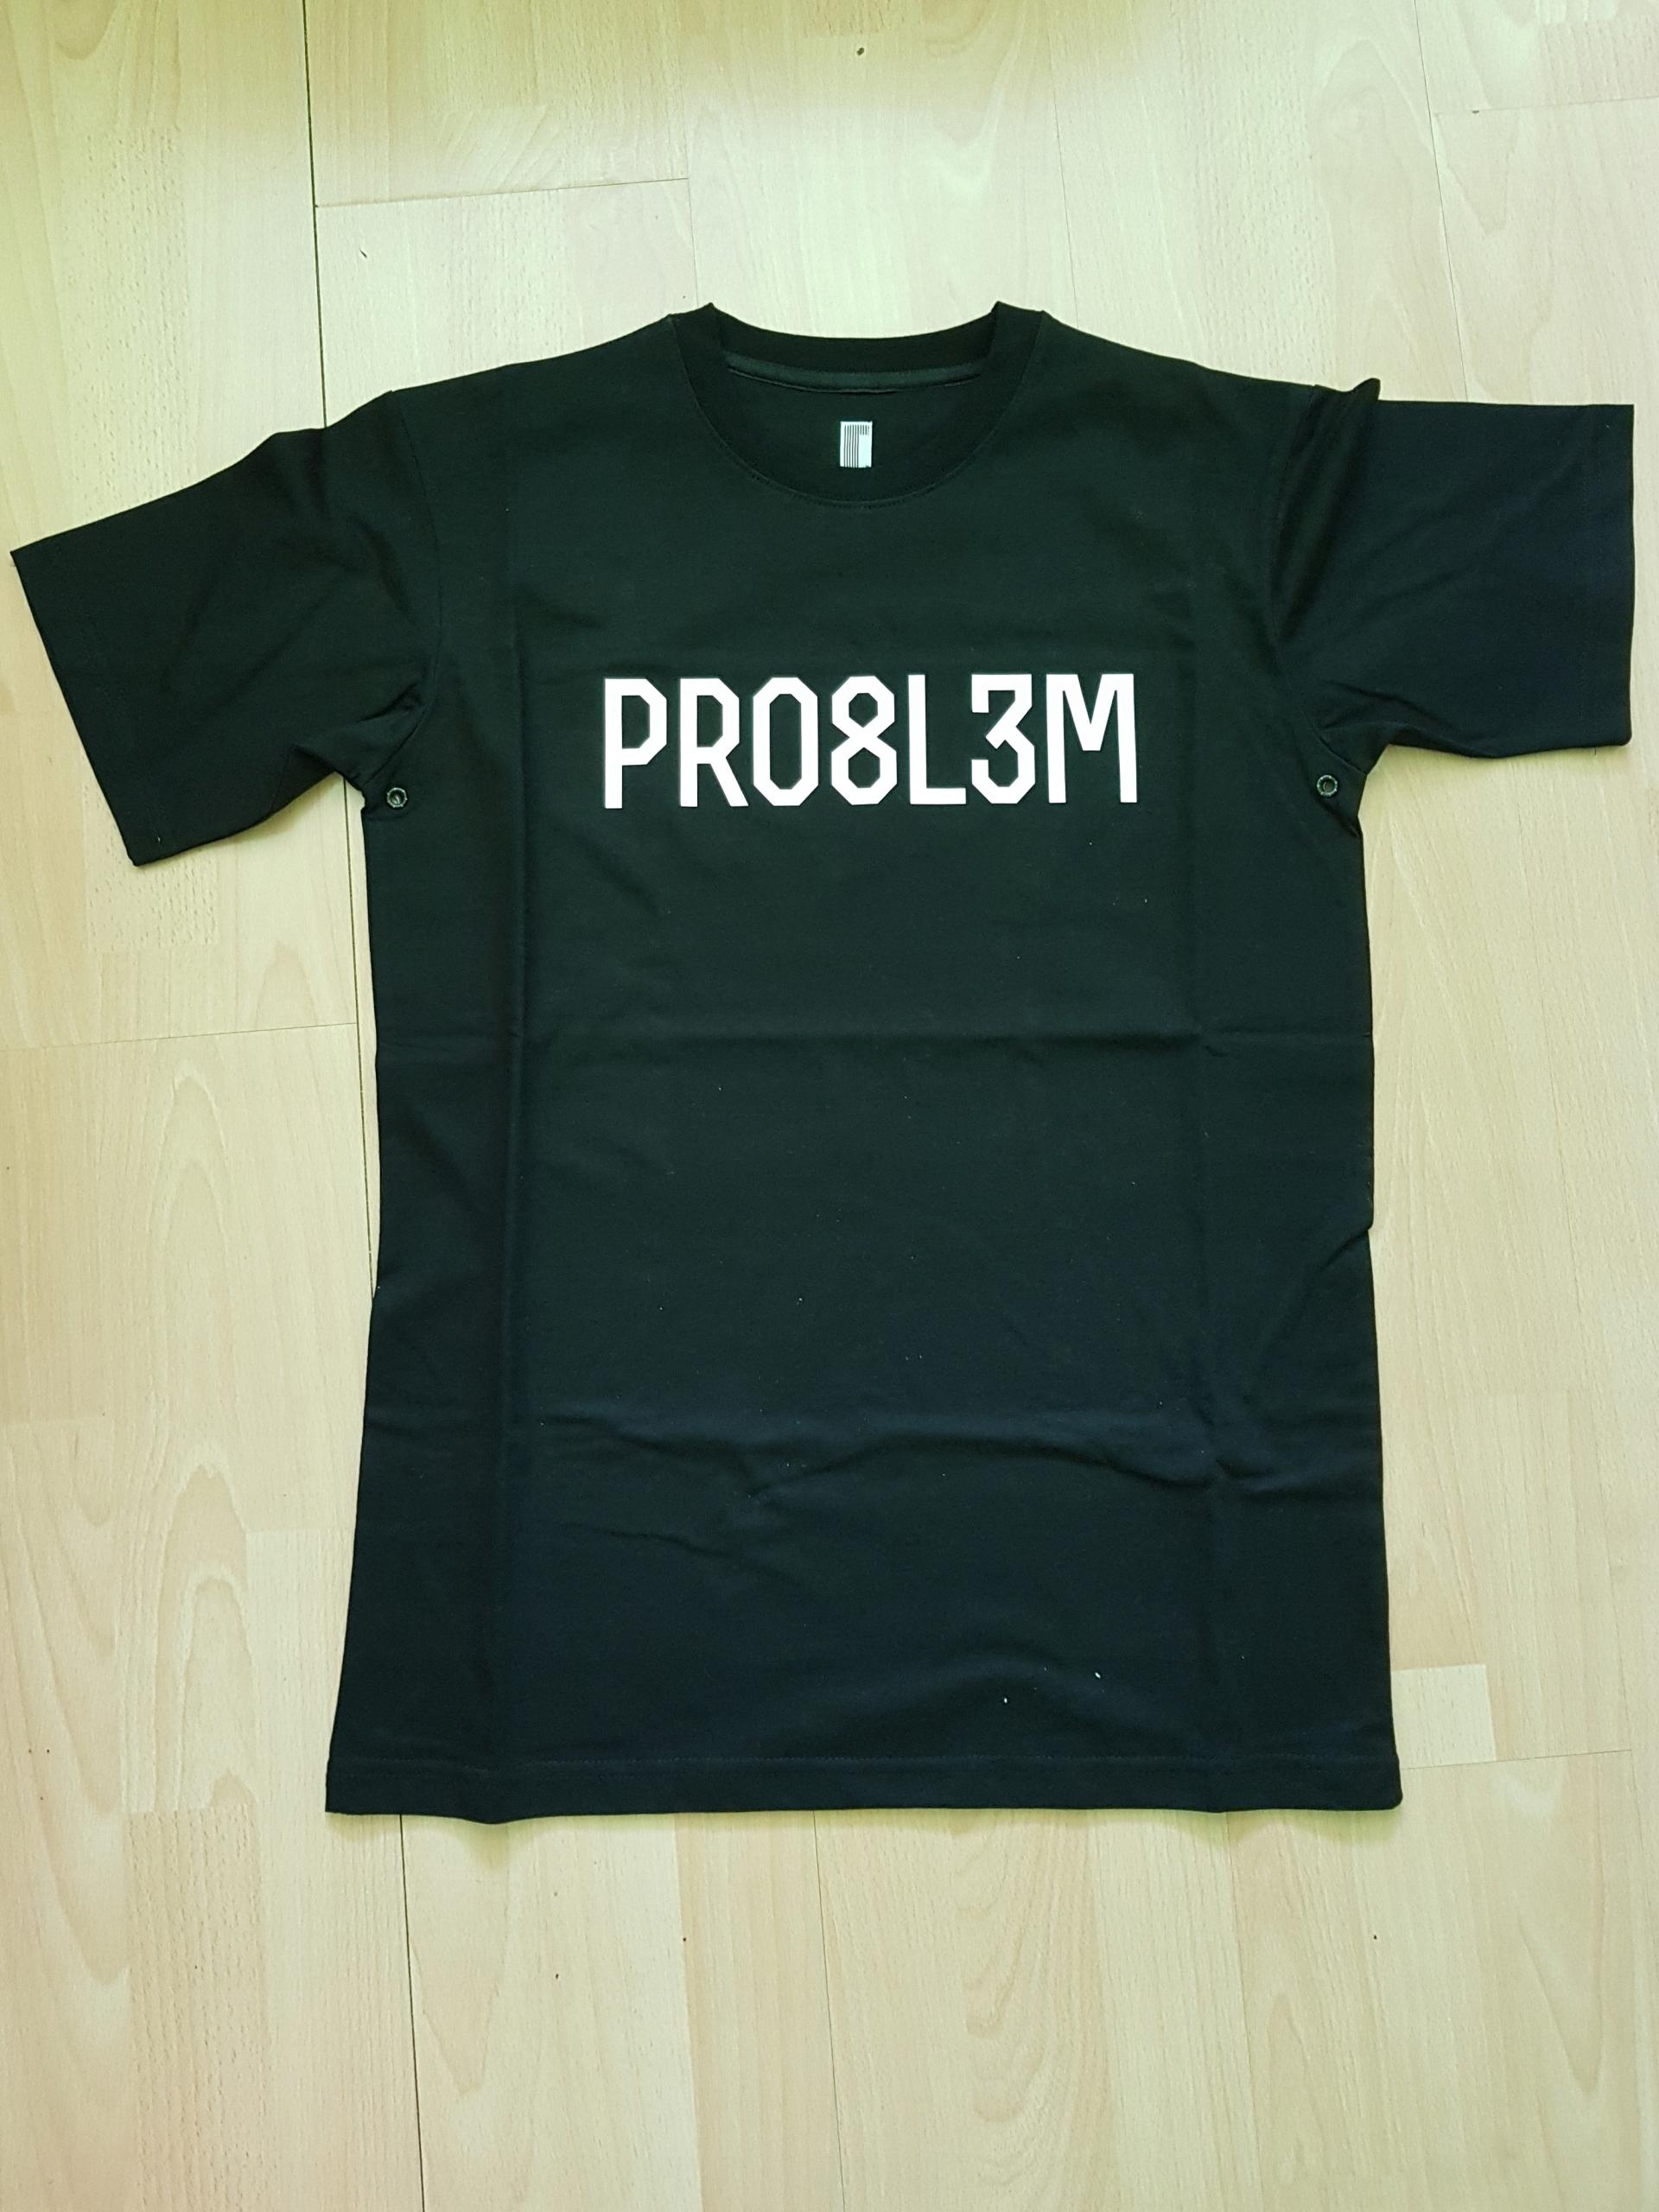 T-shirt Pro8l3m nowy, rozmiar M, klasyczne logo.